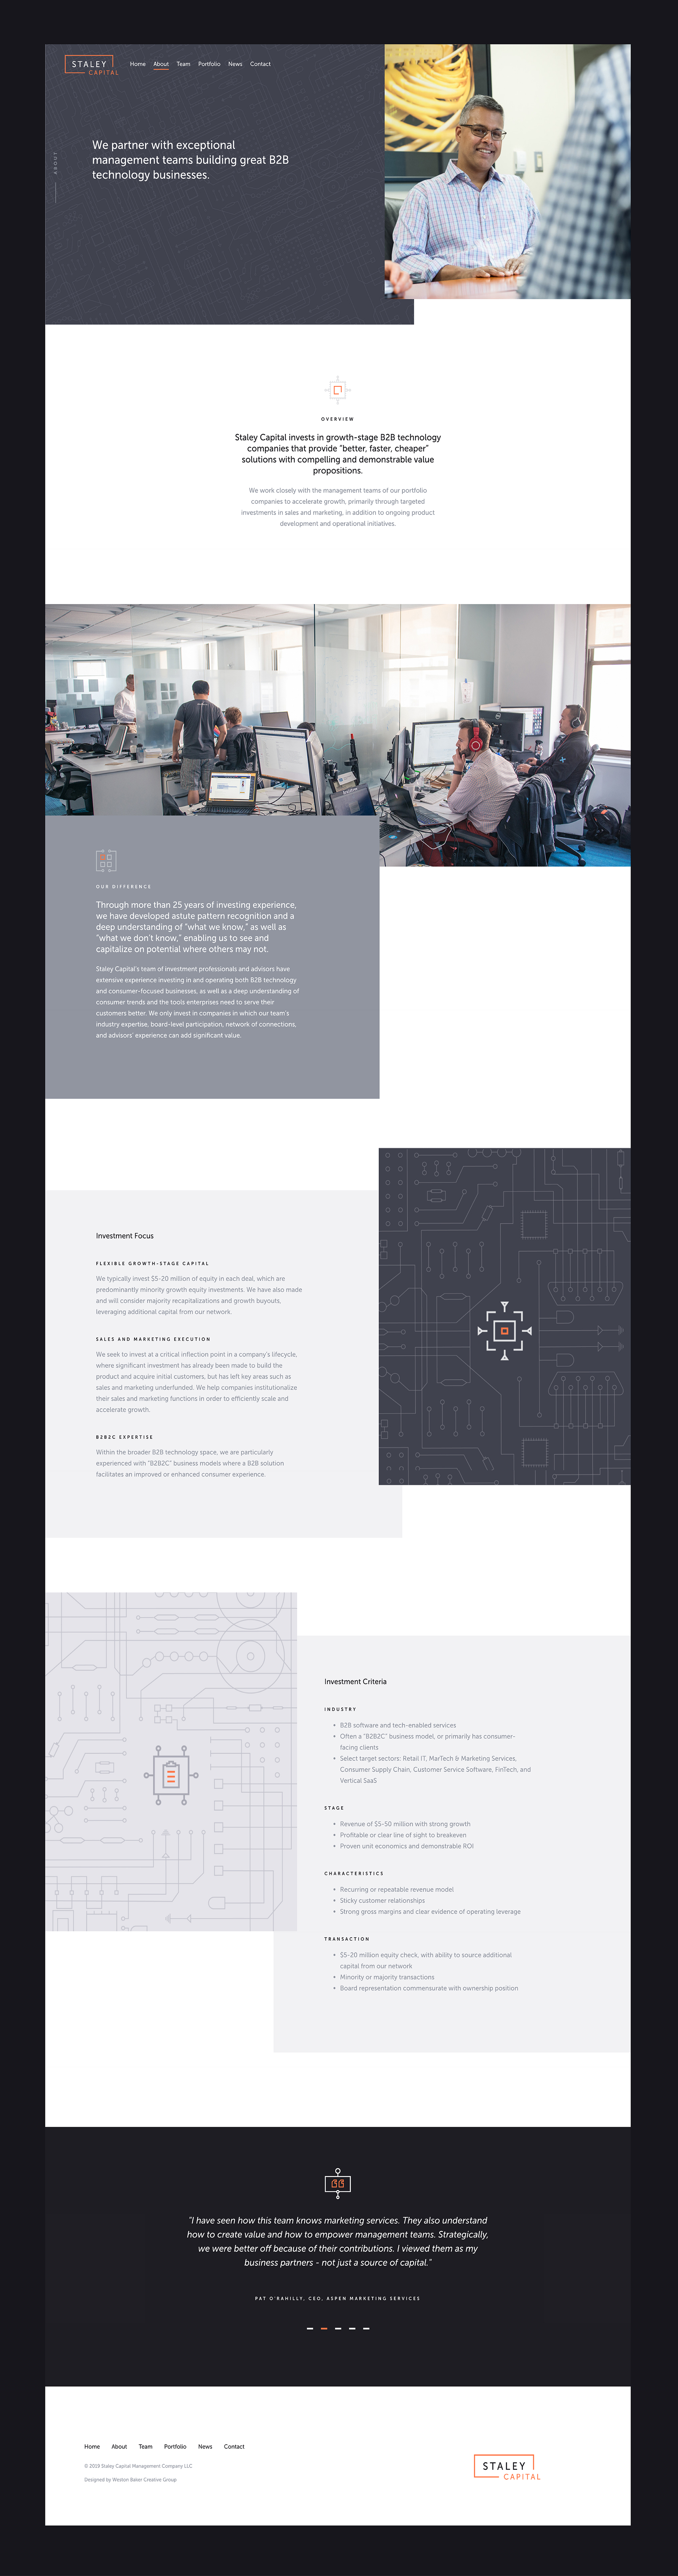 About - Dark Background-2-01-small.jpg